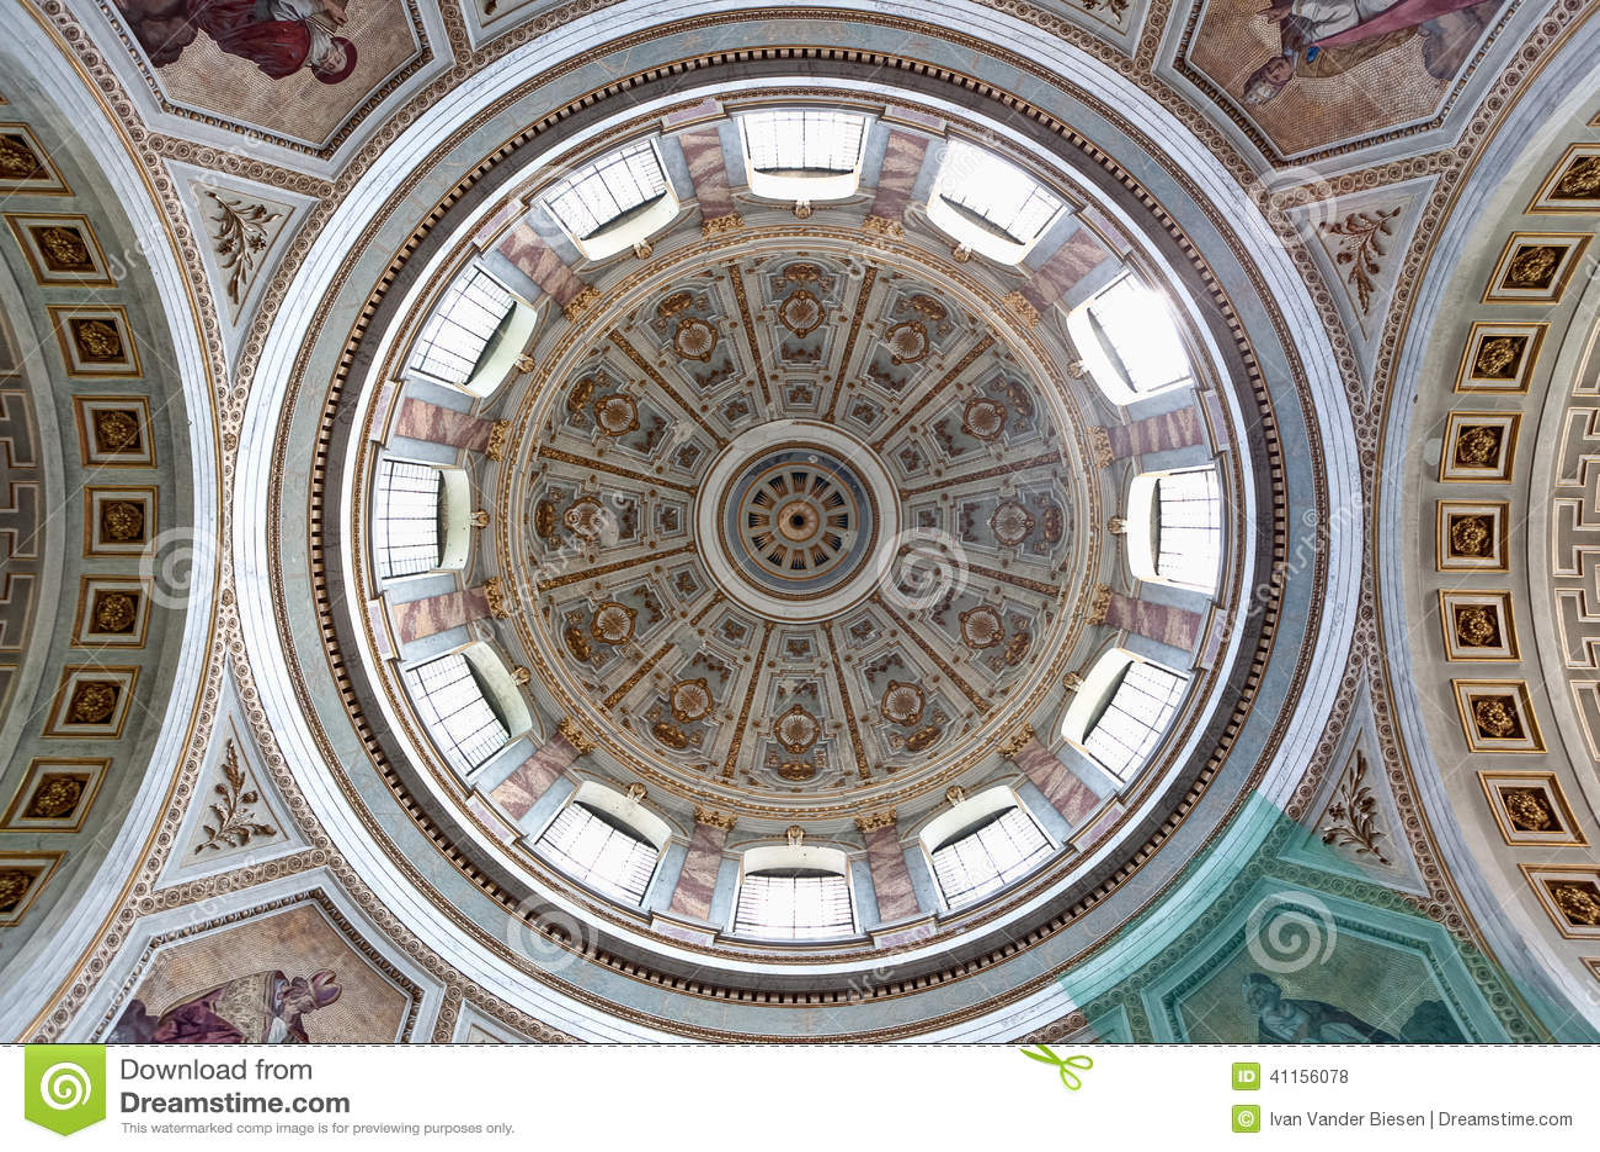 Copula Esztergom Basilica, Hungary